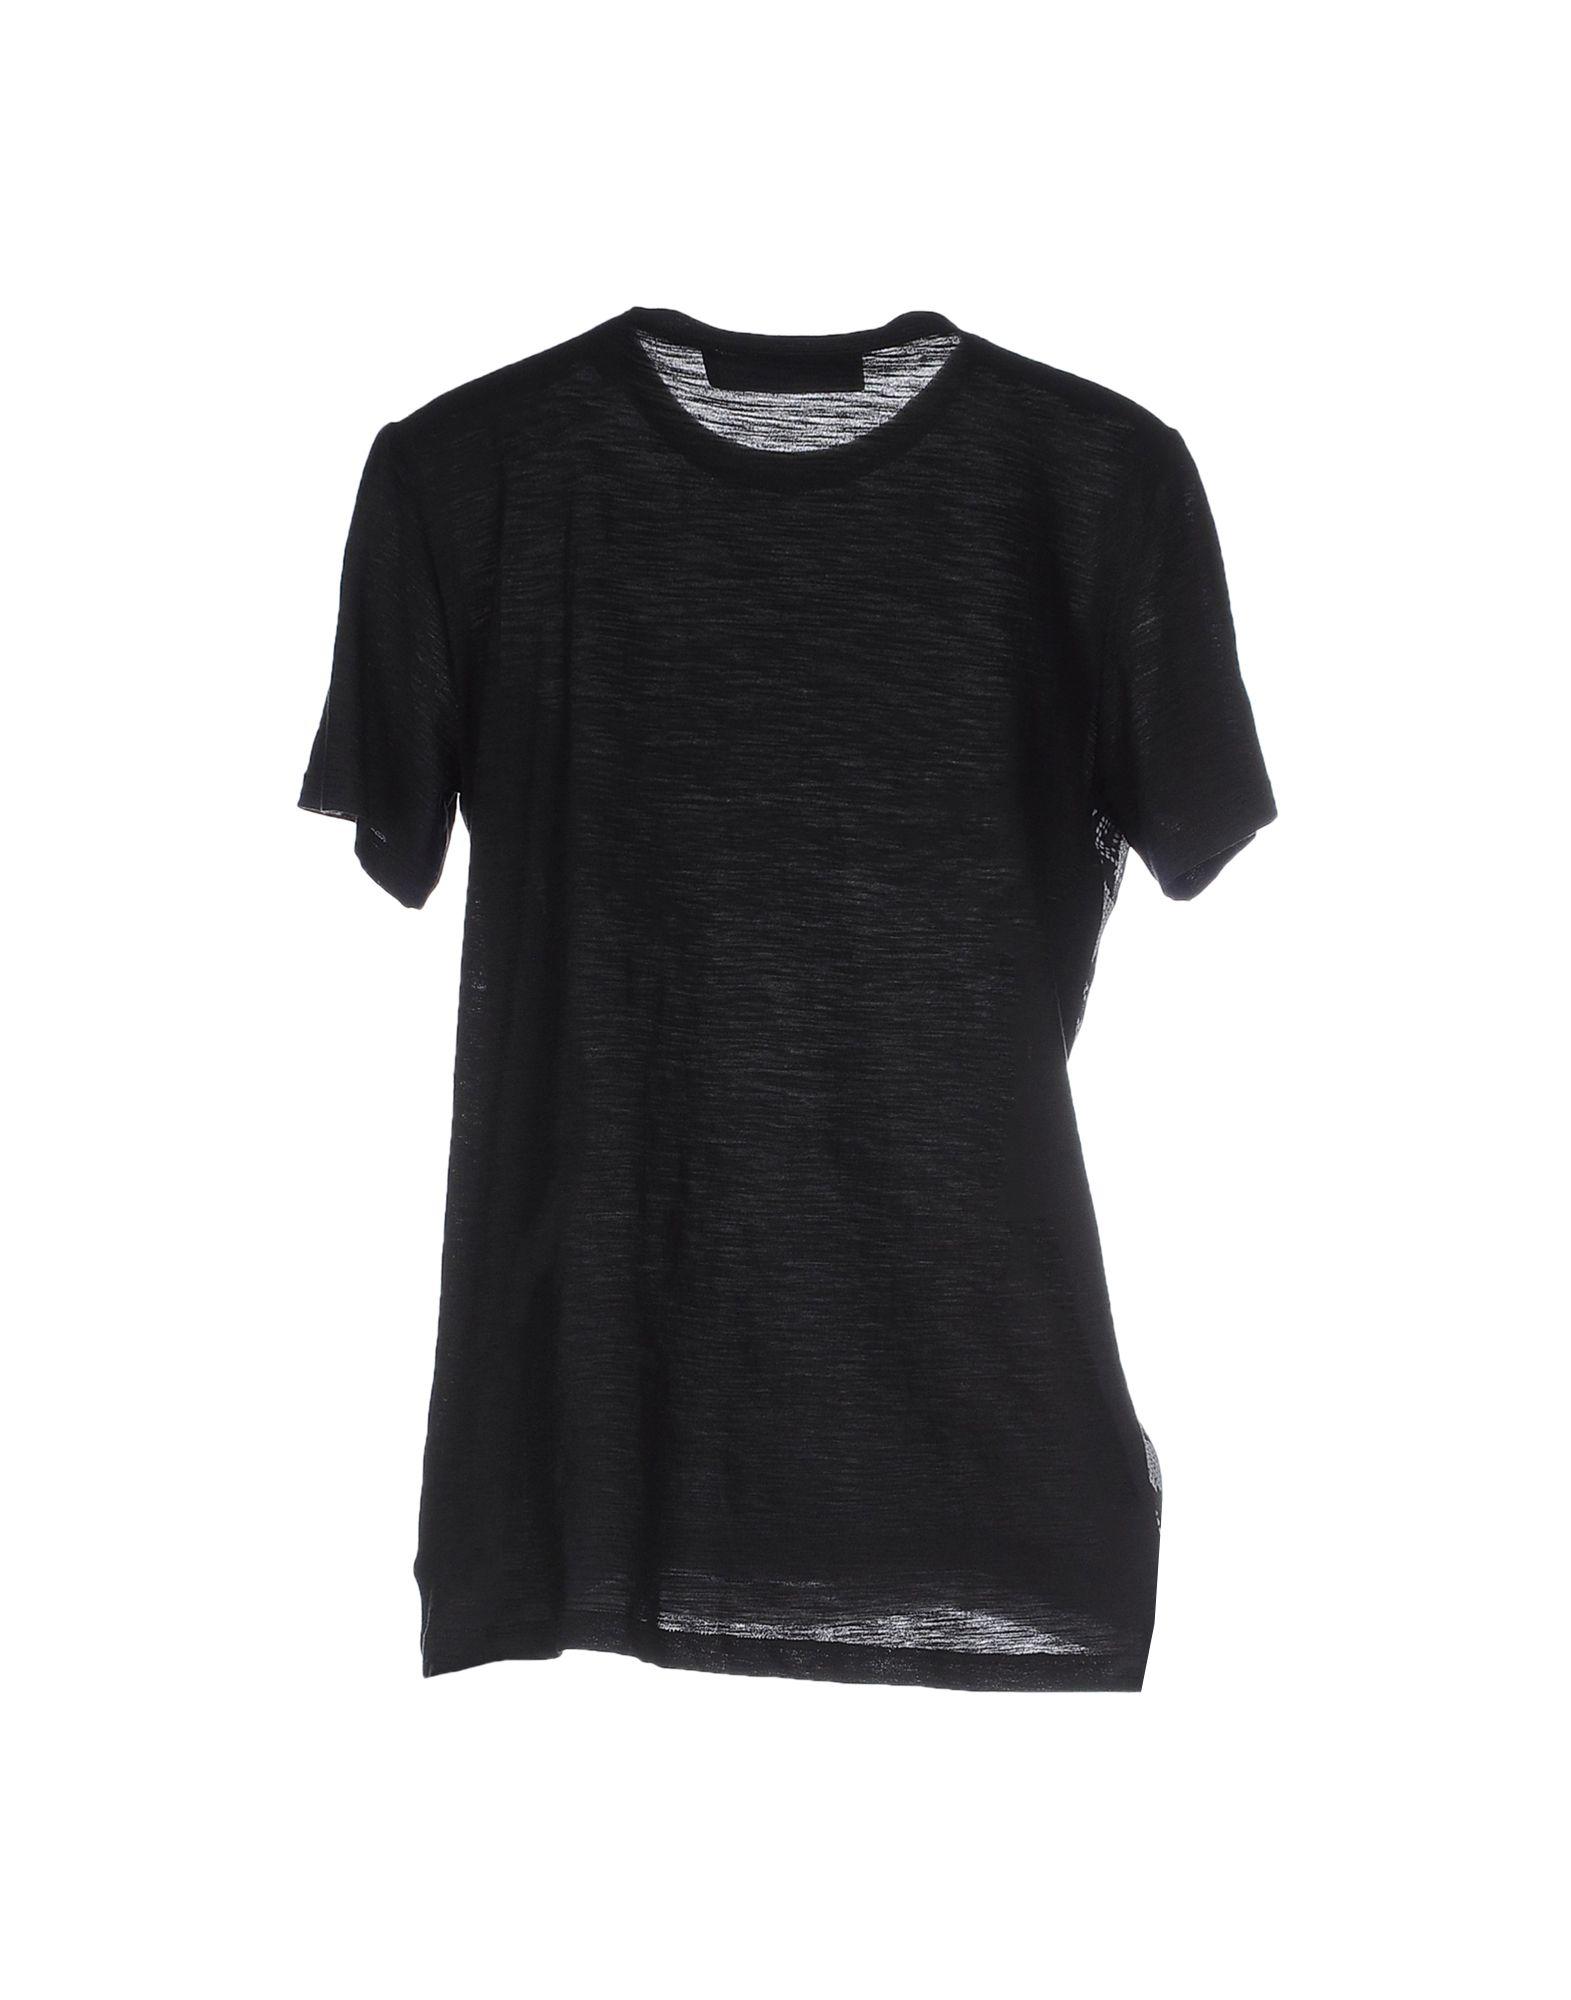 proenza schouler t shirt in black lyst